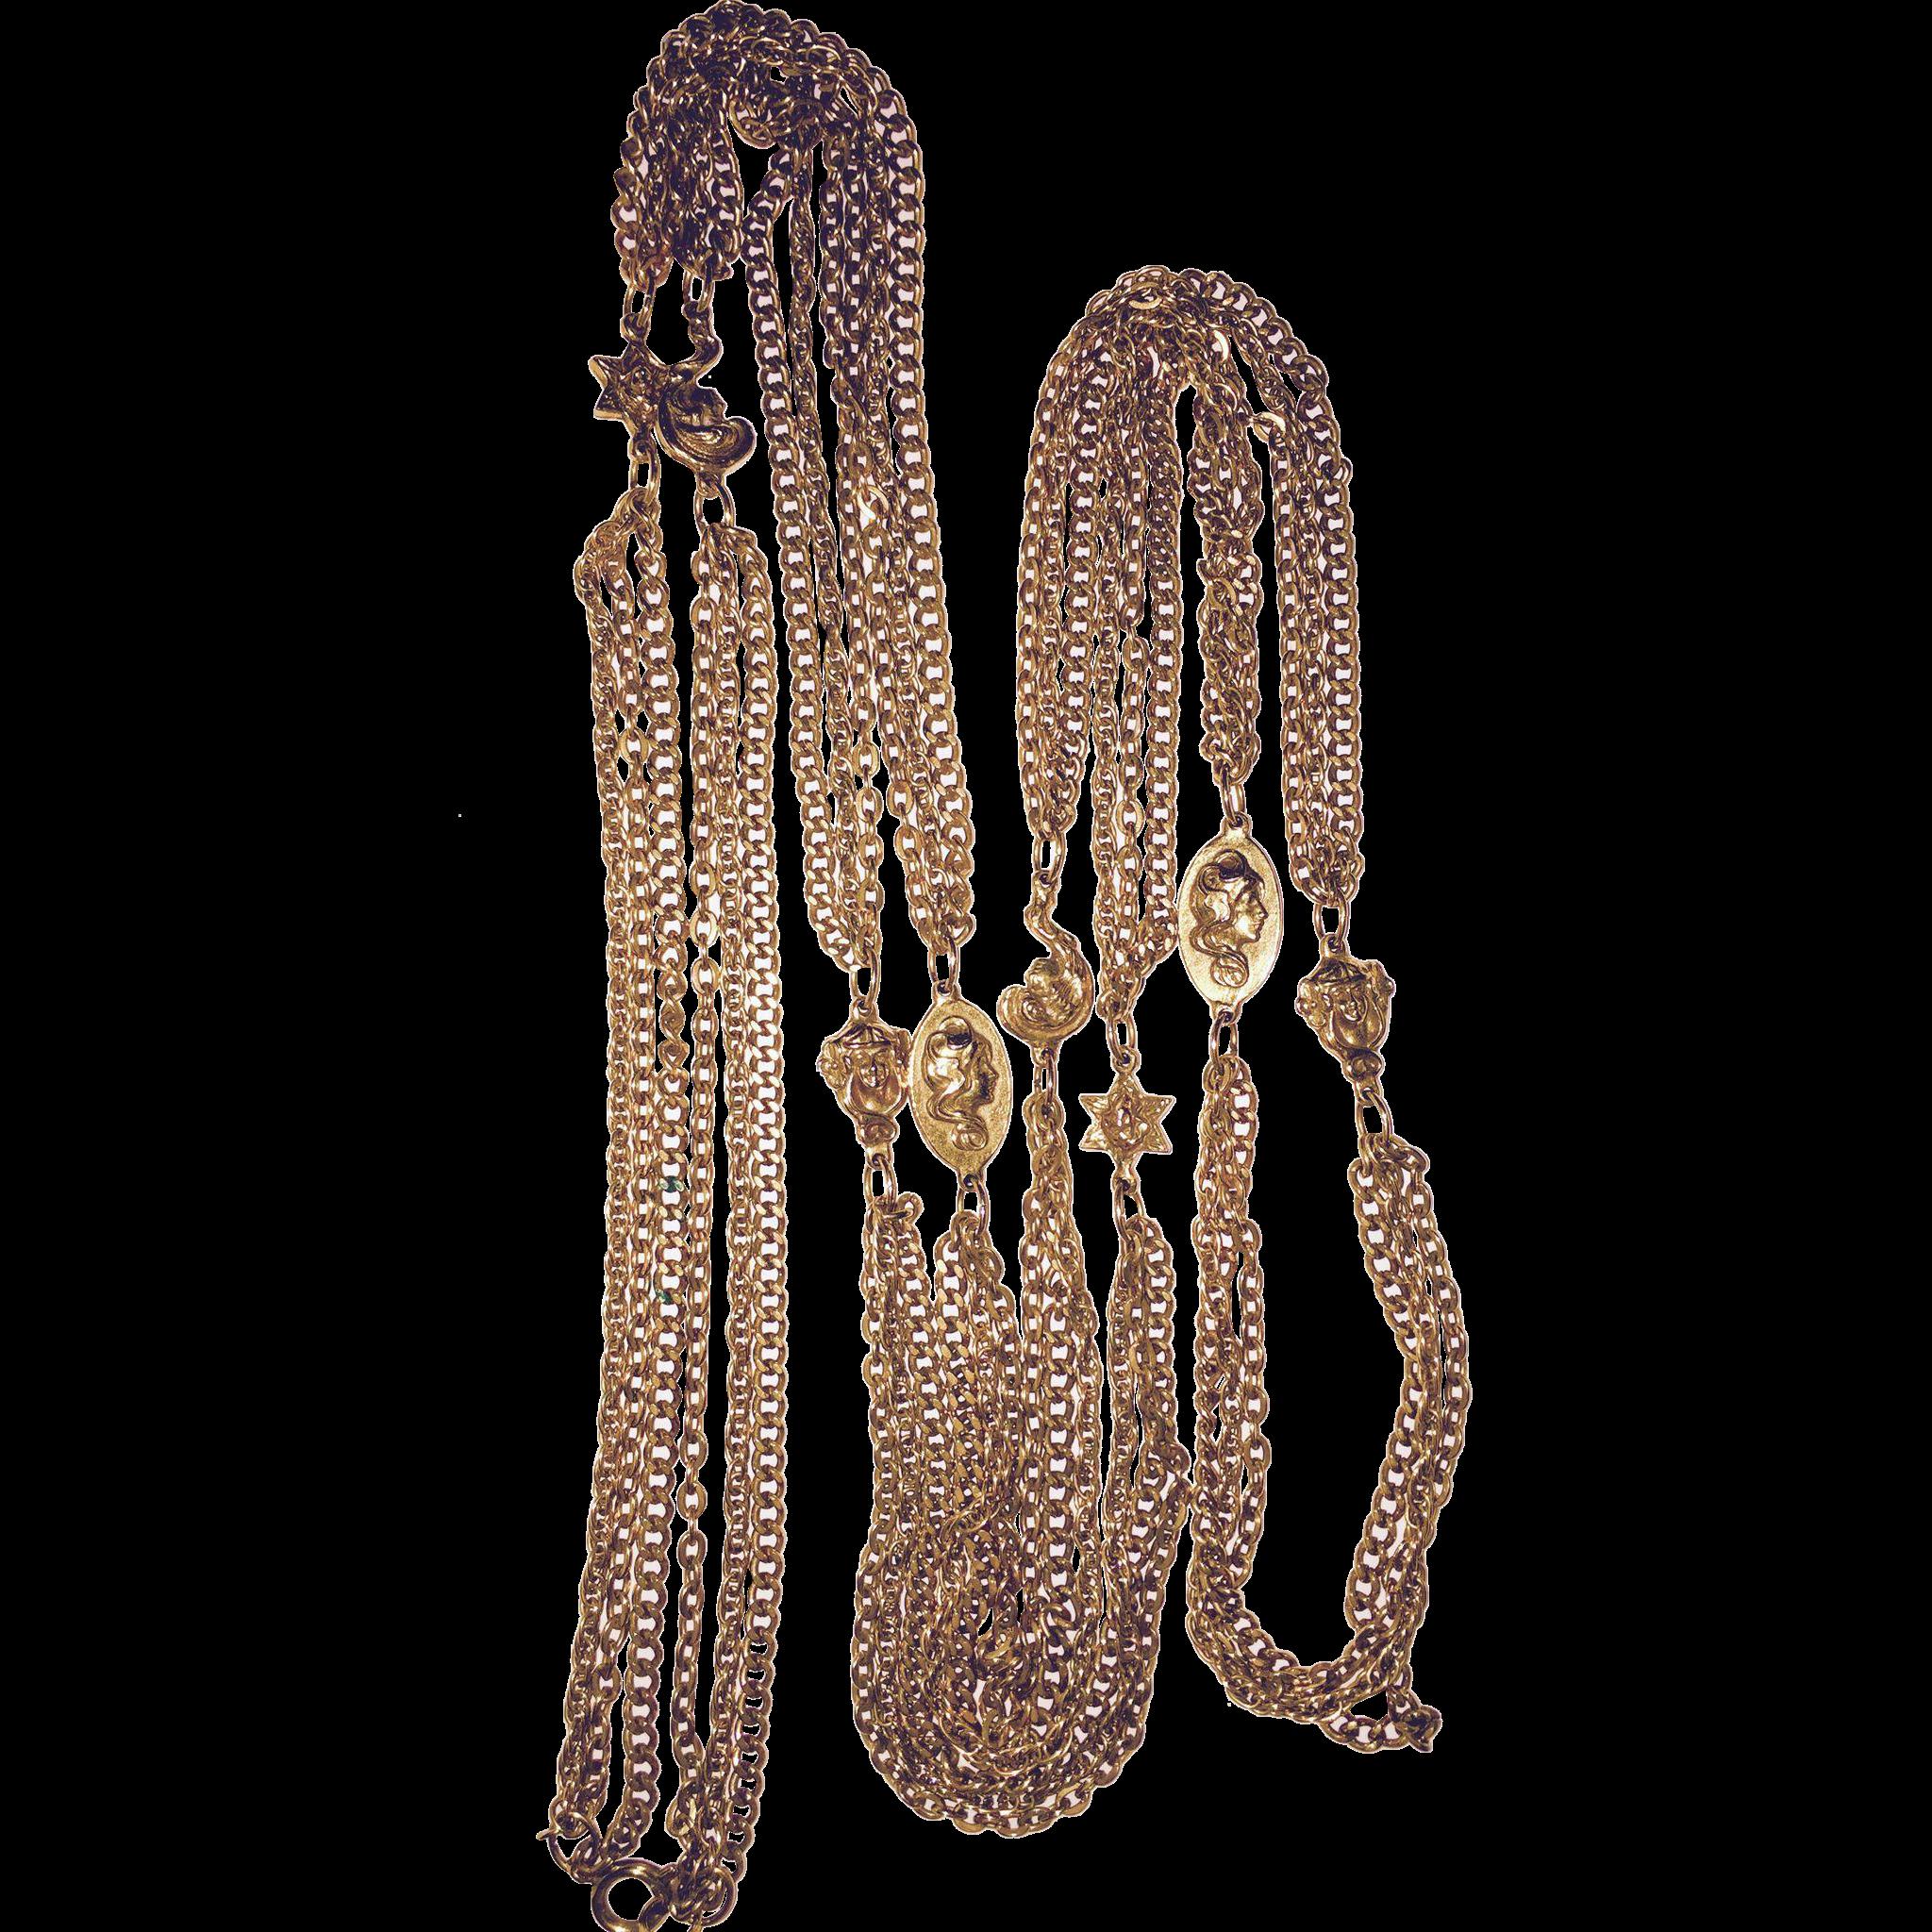 Vintage 1960s Long Necklace Earrings Etruscan Design